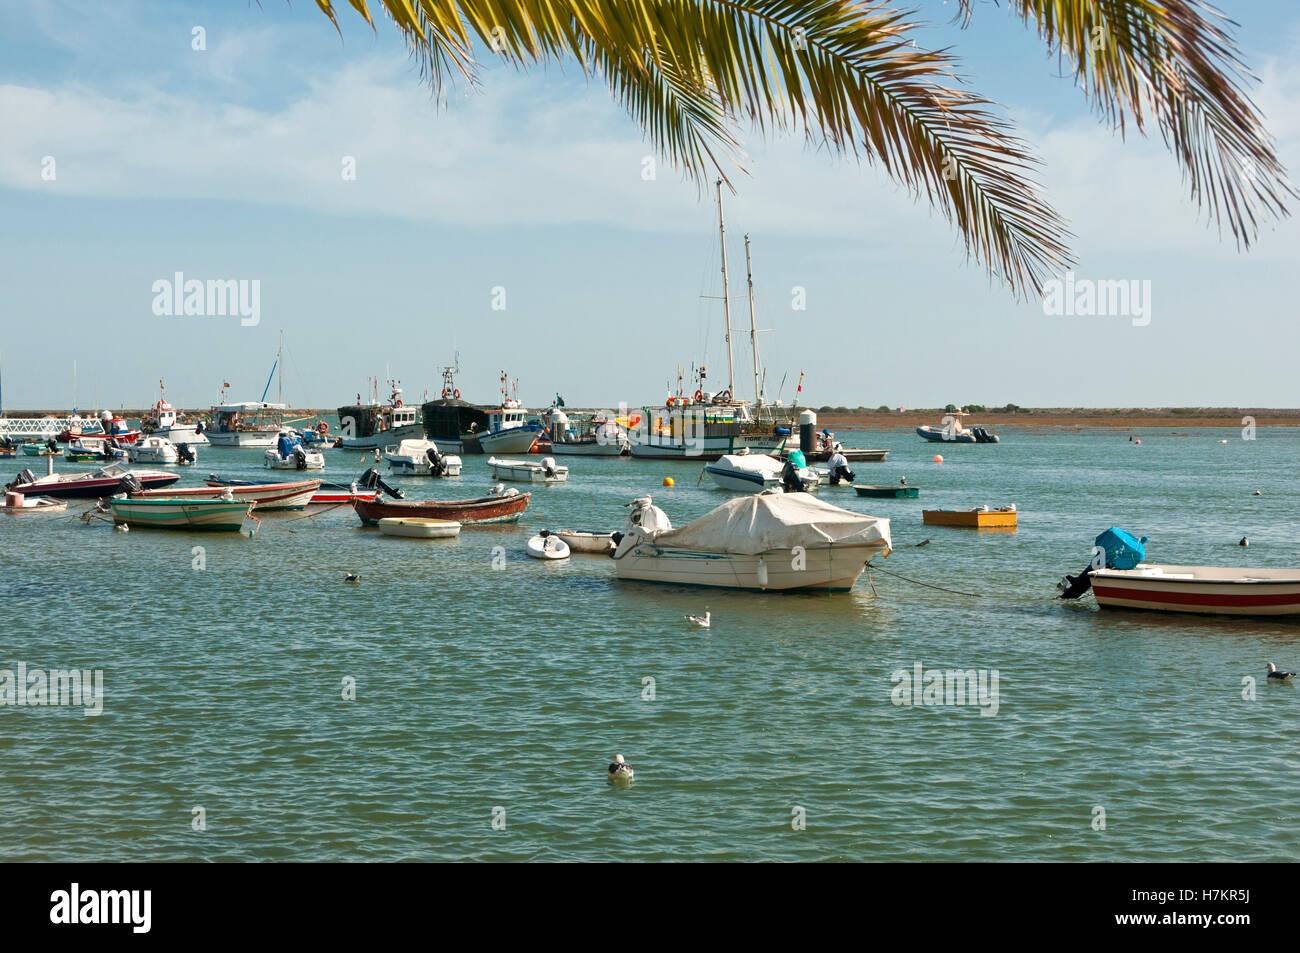 Seafront and boats, Santa Luzia, Algarve, Portugal Stock Photo